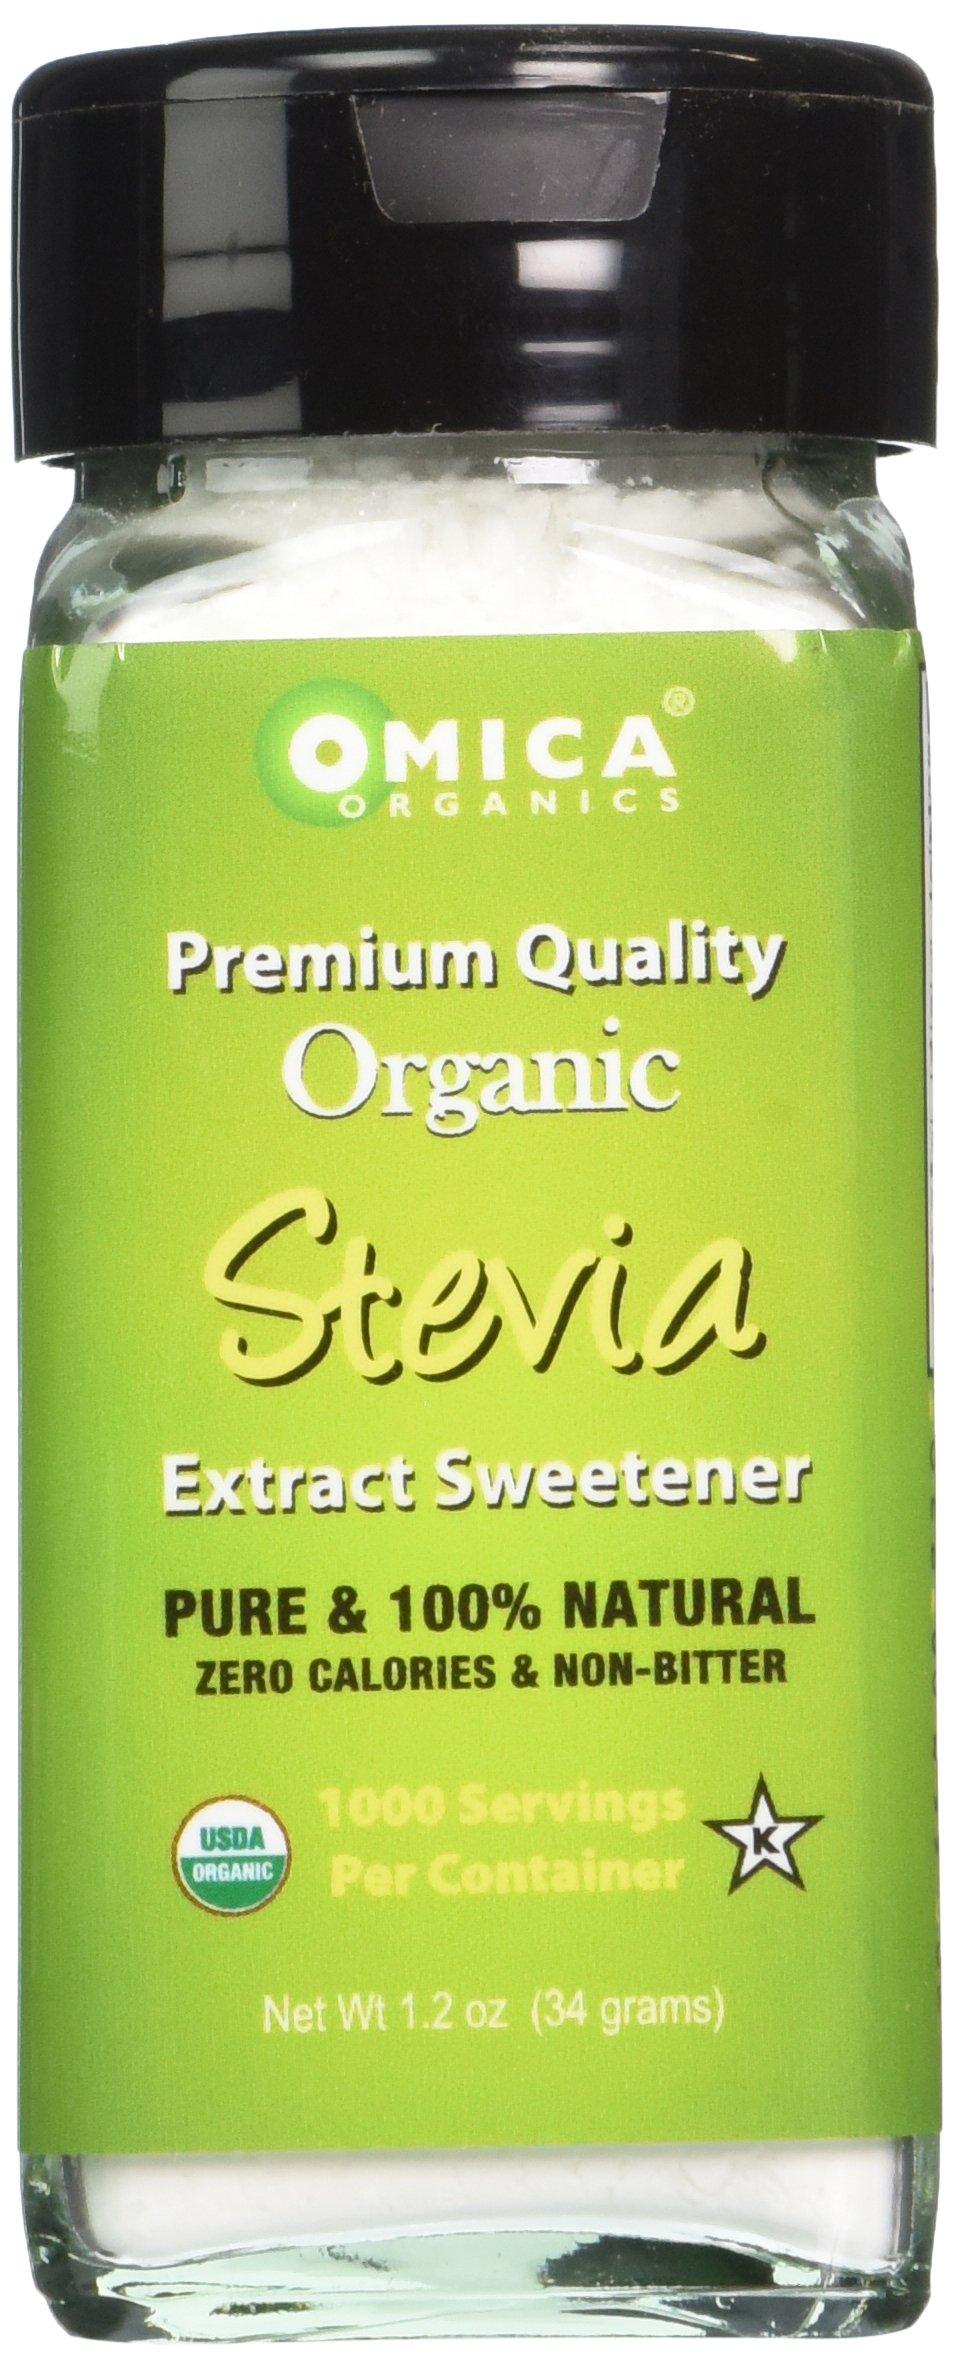 Omica Organics Stevia Extract Sweetener Powder (1.2 oz)